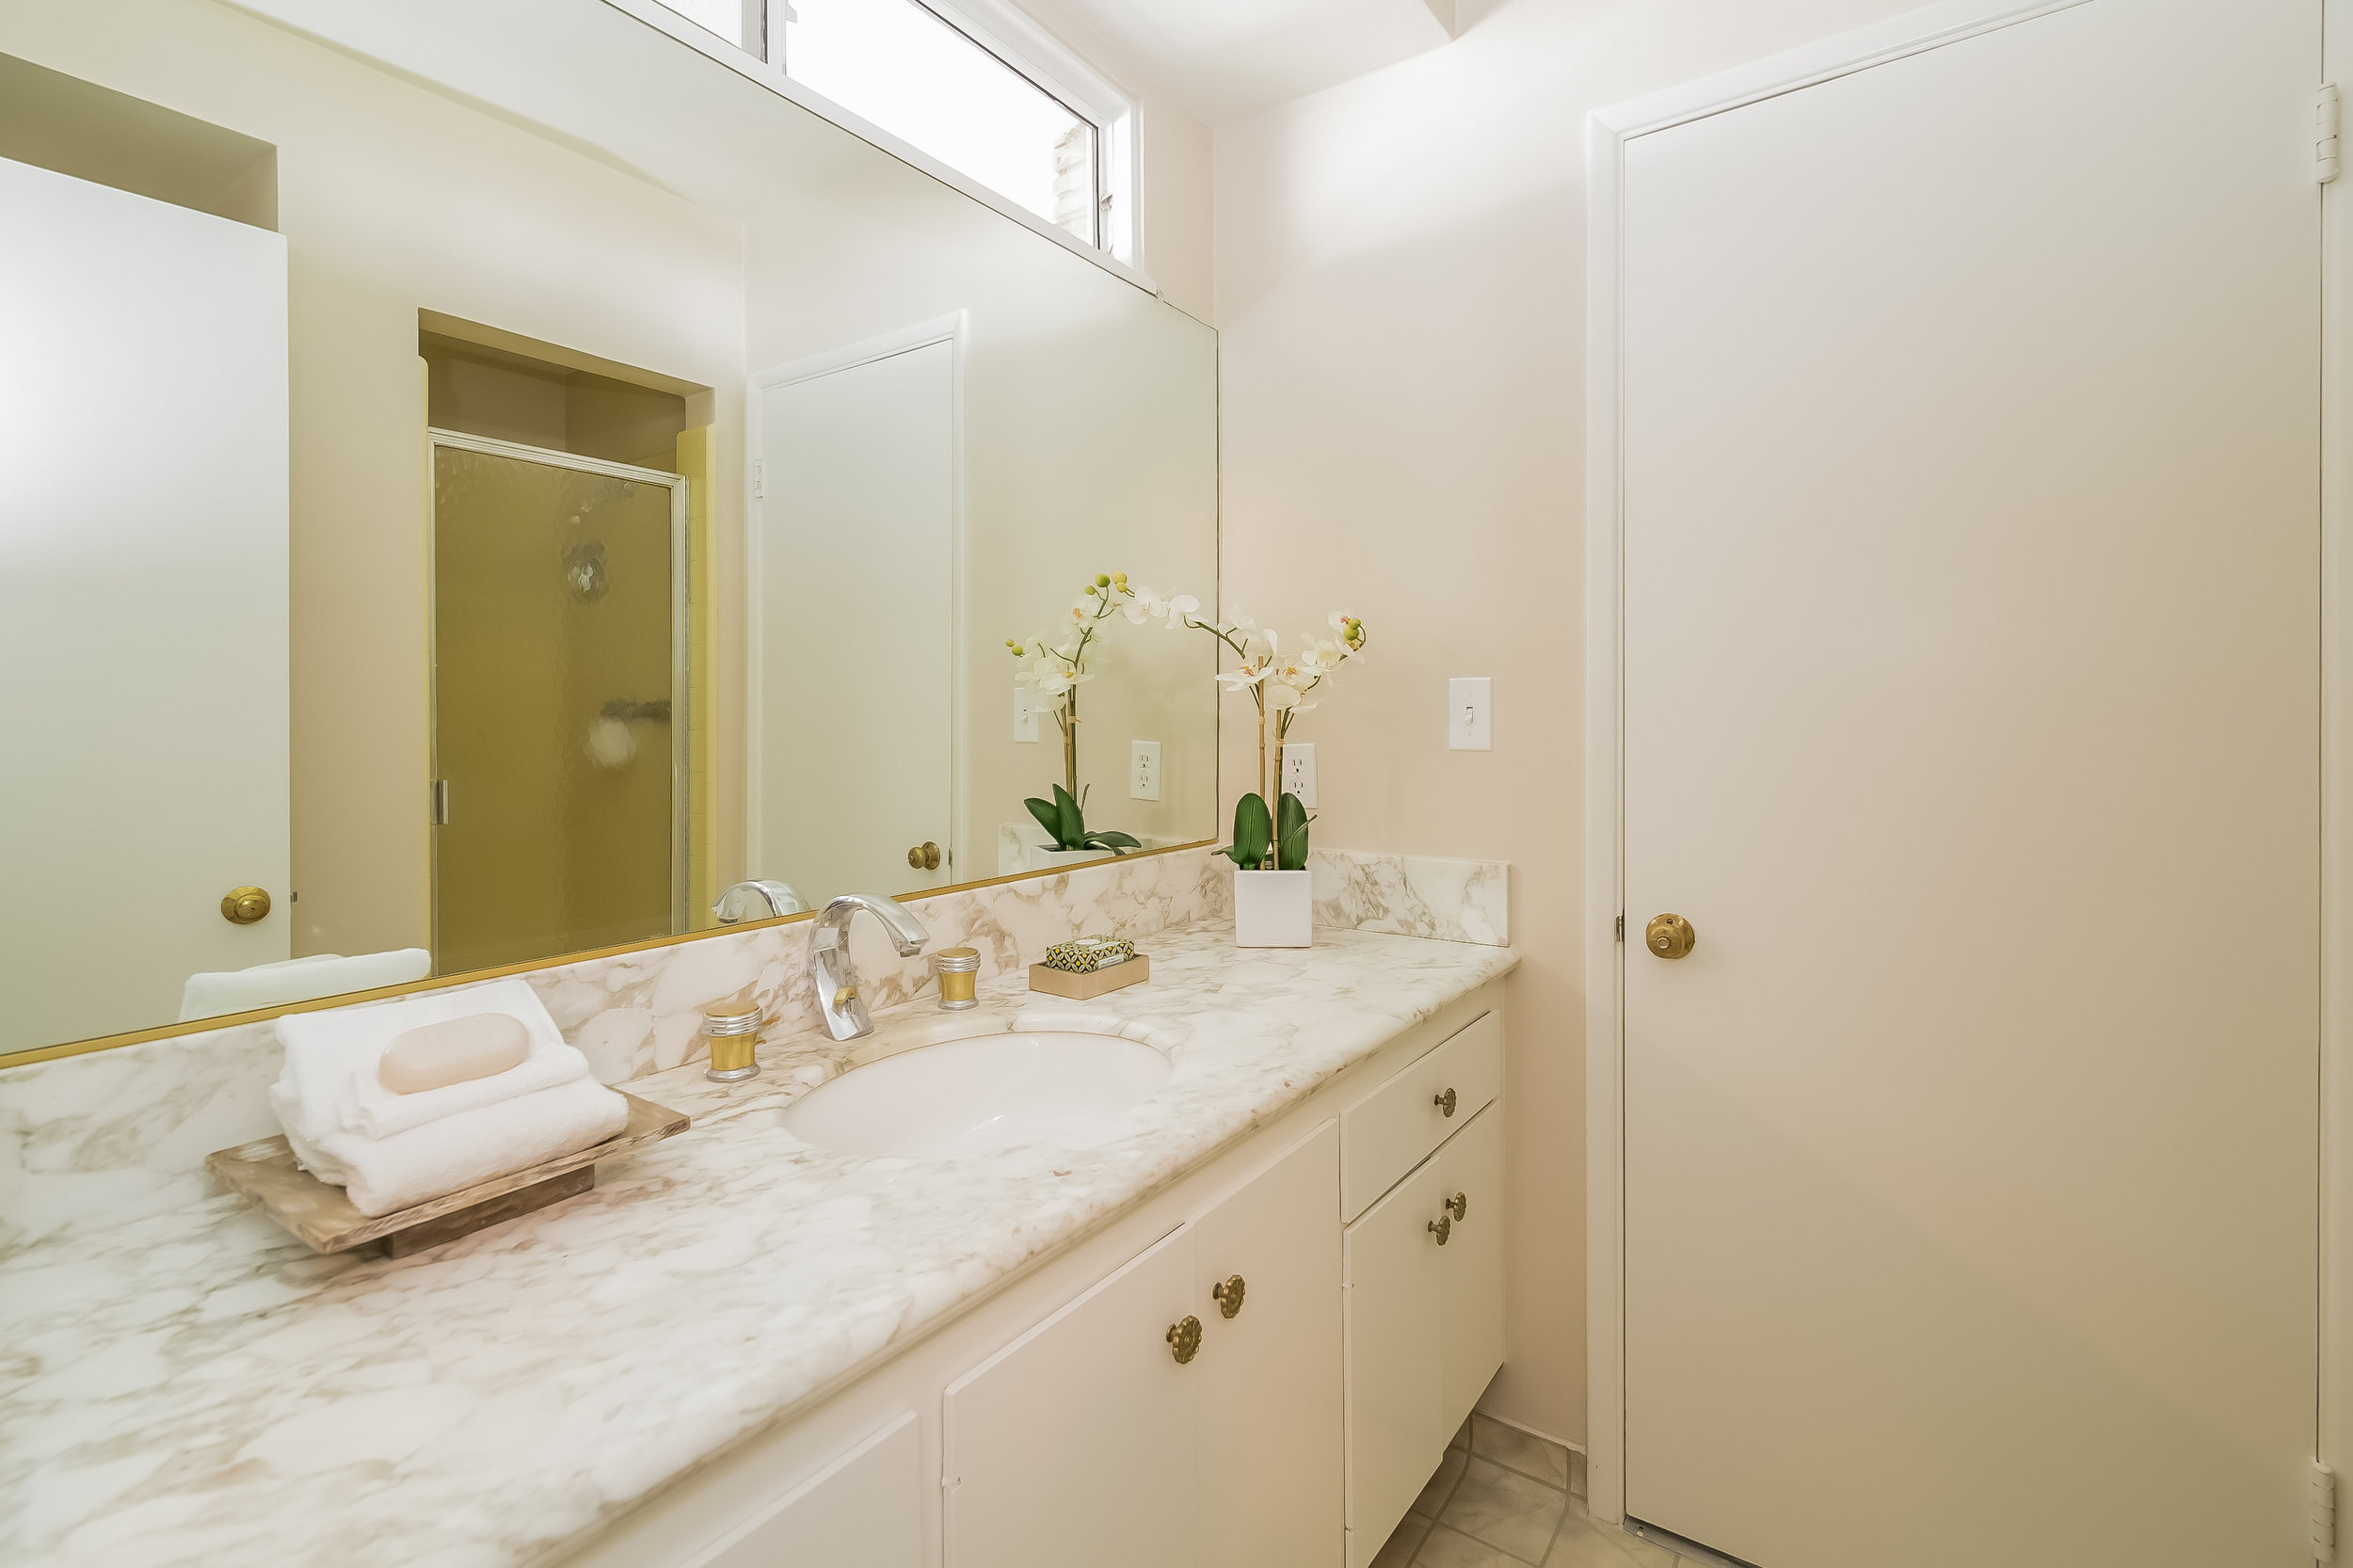 041-Bathroom-2805401-large copy.jpg